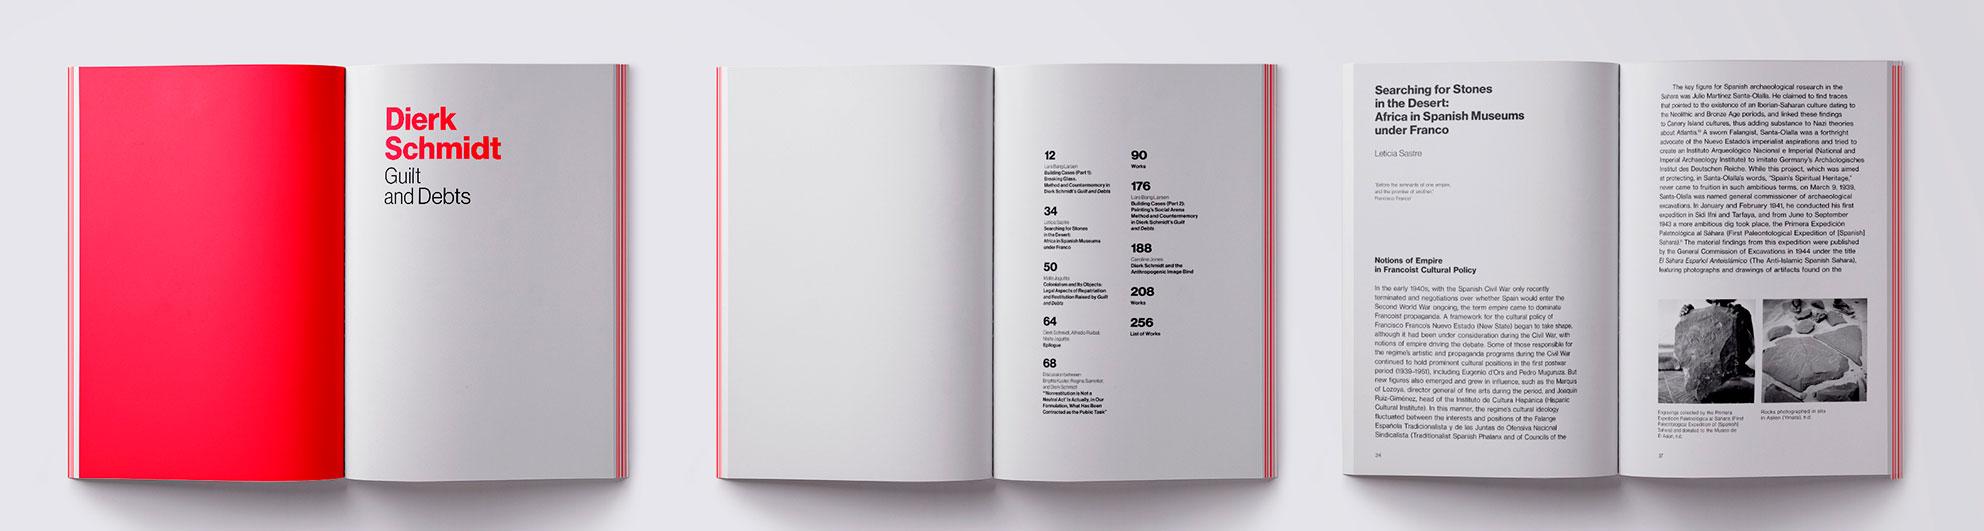 DIERK-SCHIMIDT---MUSEO-REINA-SOFIA-001